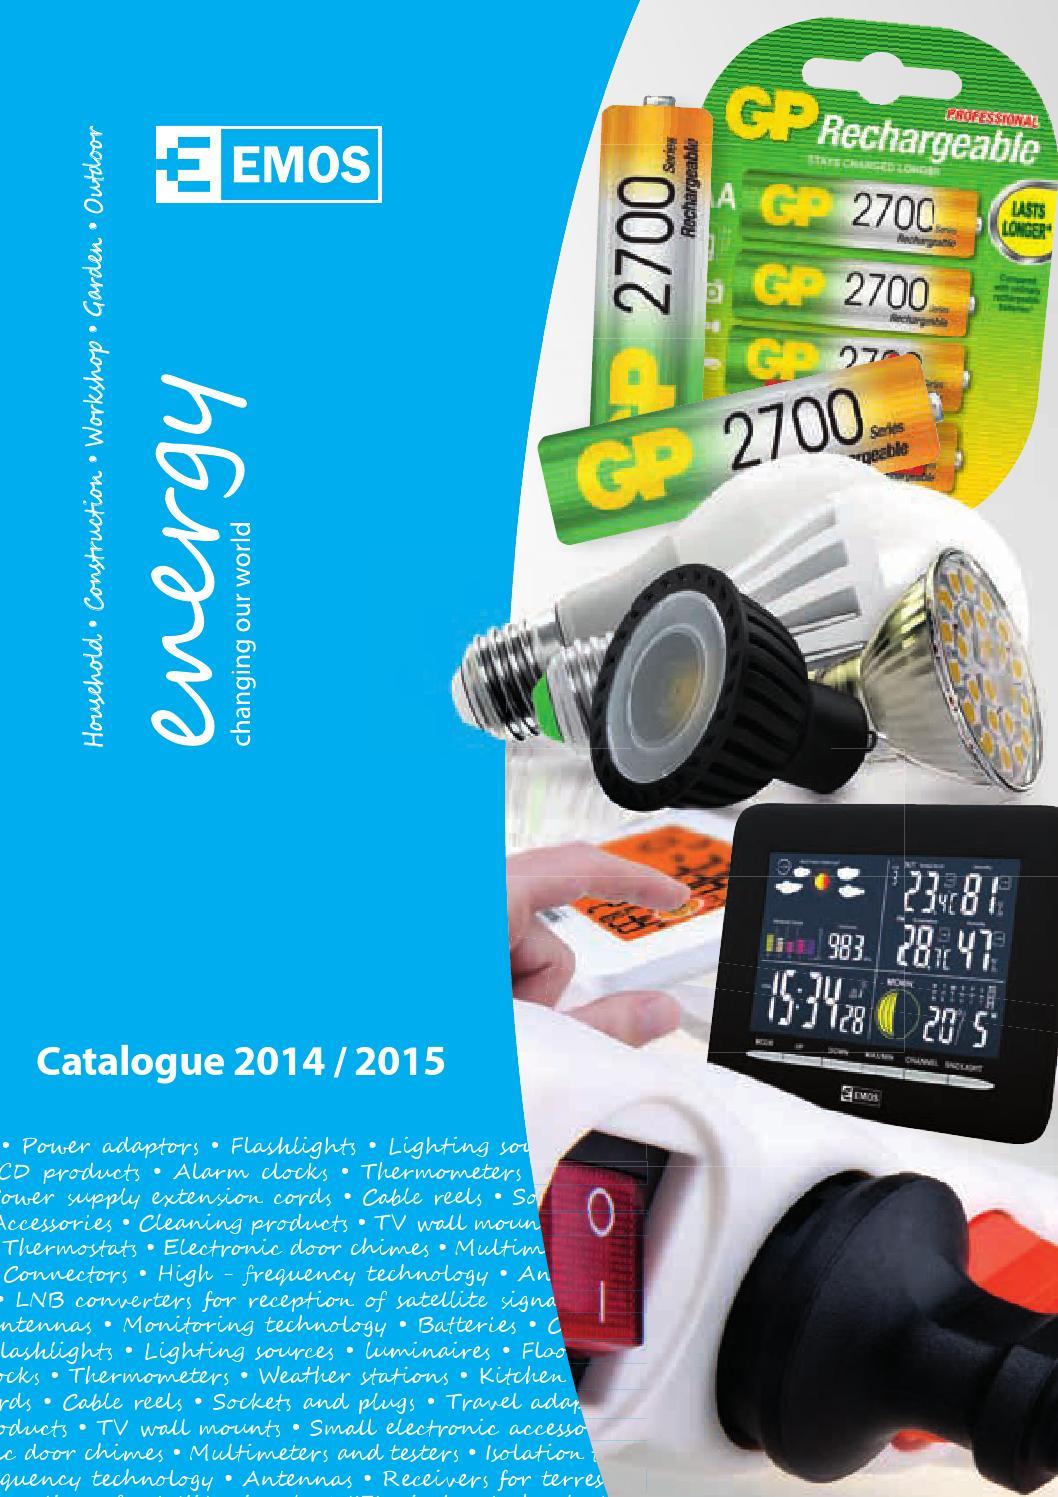 Katalg Emos 2014 2015 By El Com Elektro Issuu H05rrf Outdoor Electrical Cable Per Meter Water Gardening Direct